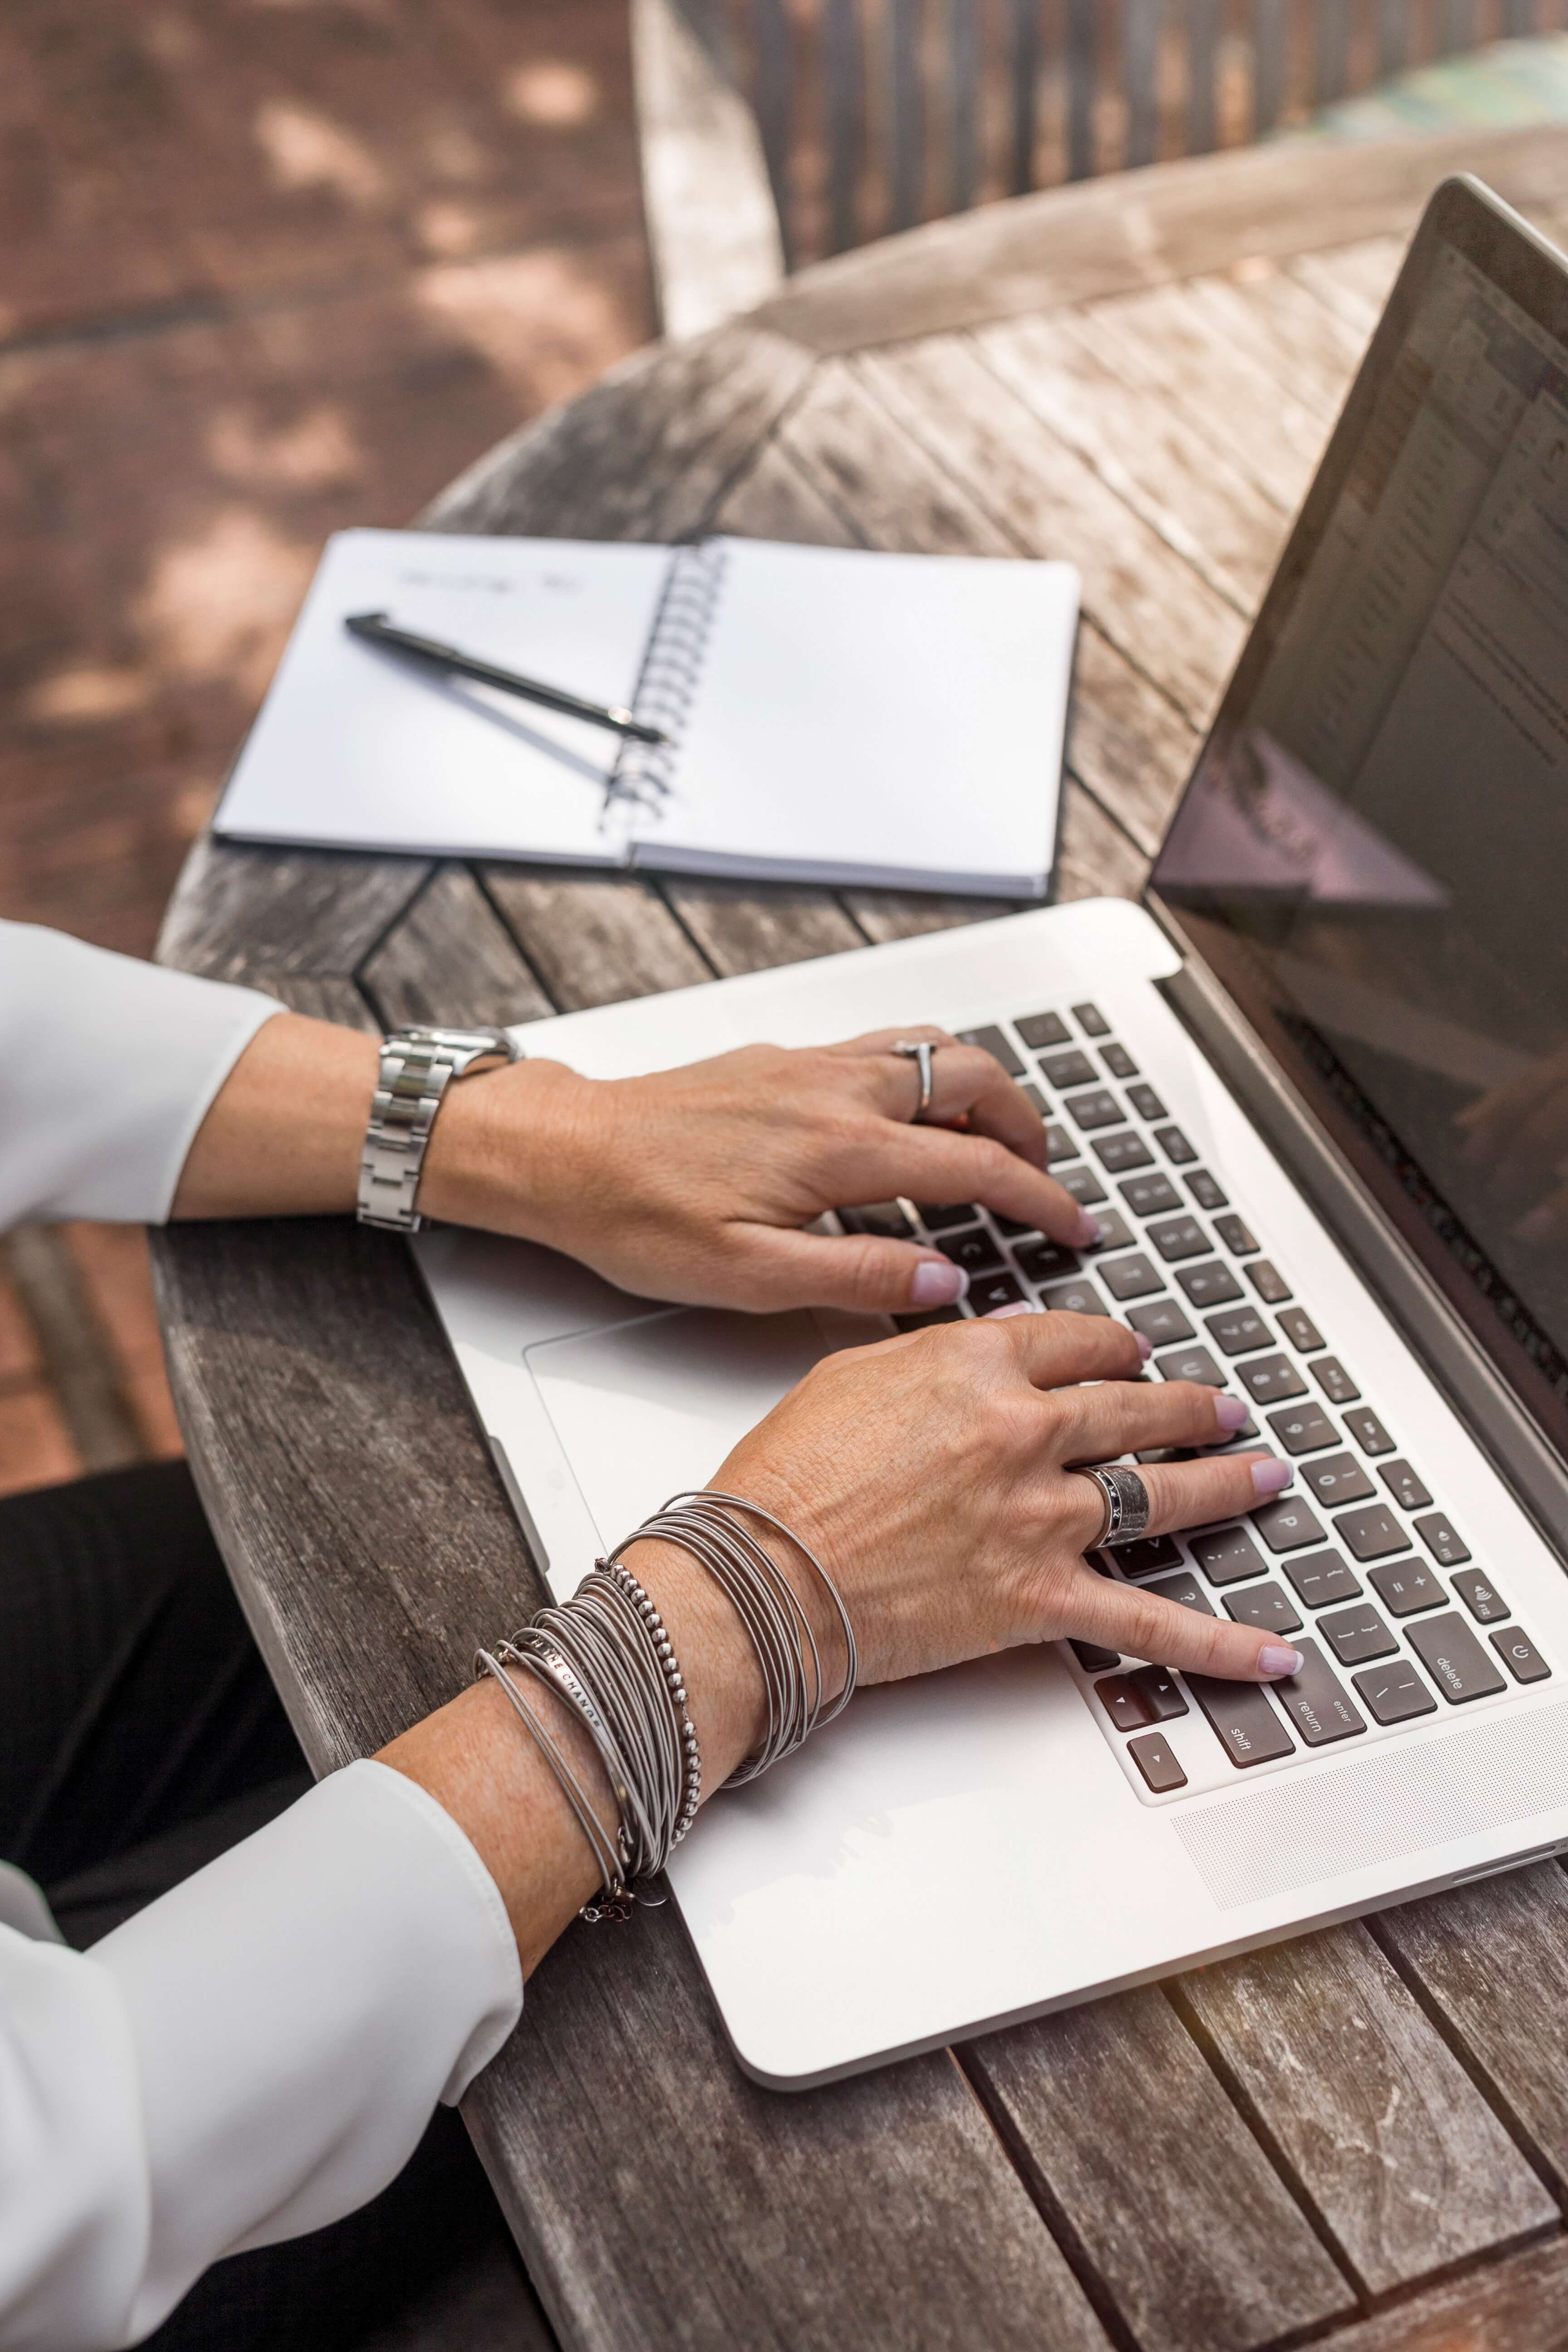 close up of woman using laptop computer